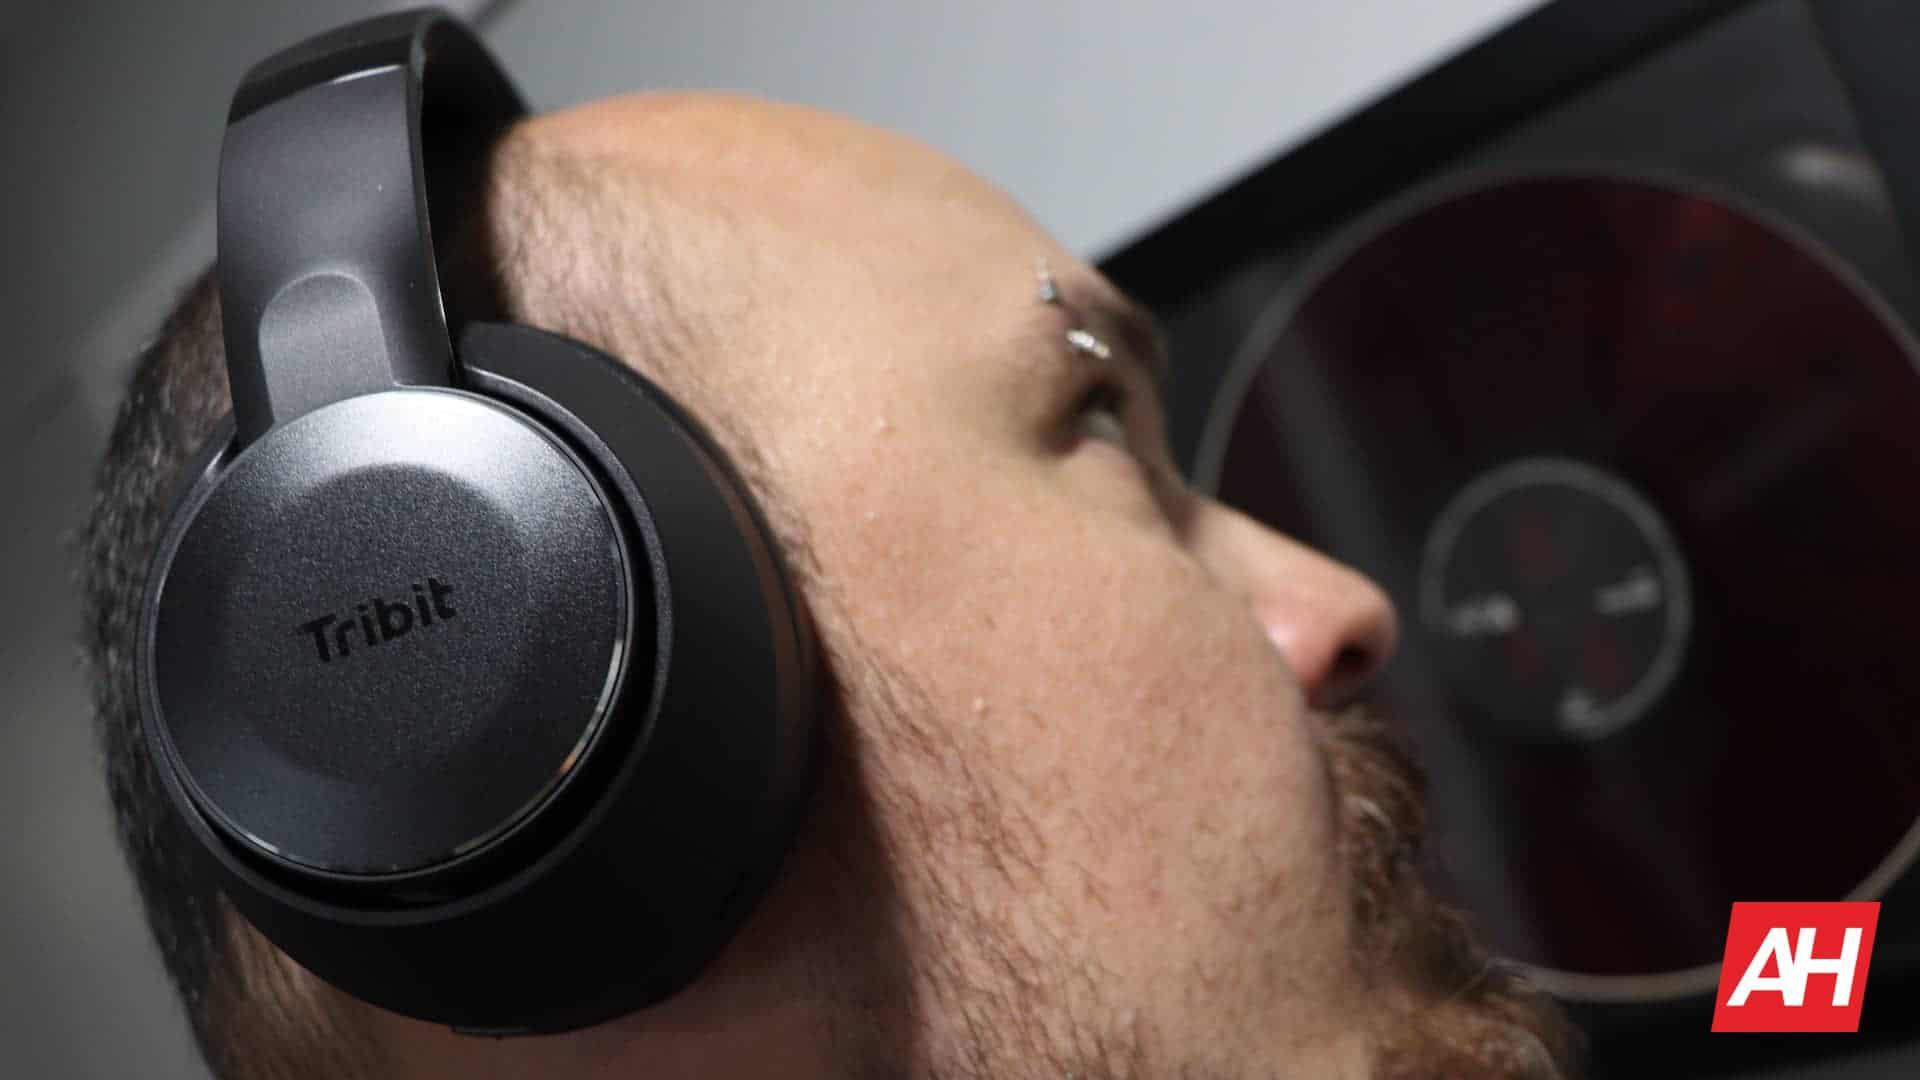 03 Tribit QuietPlus 78 review audio DG AH 2021